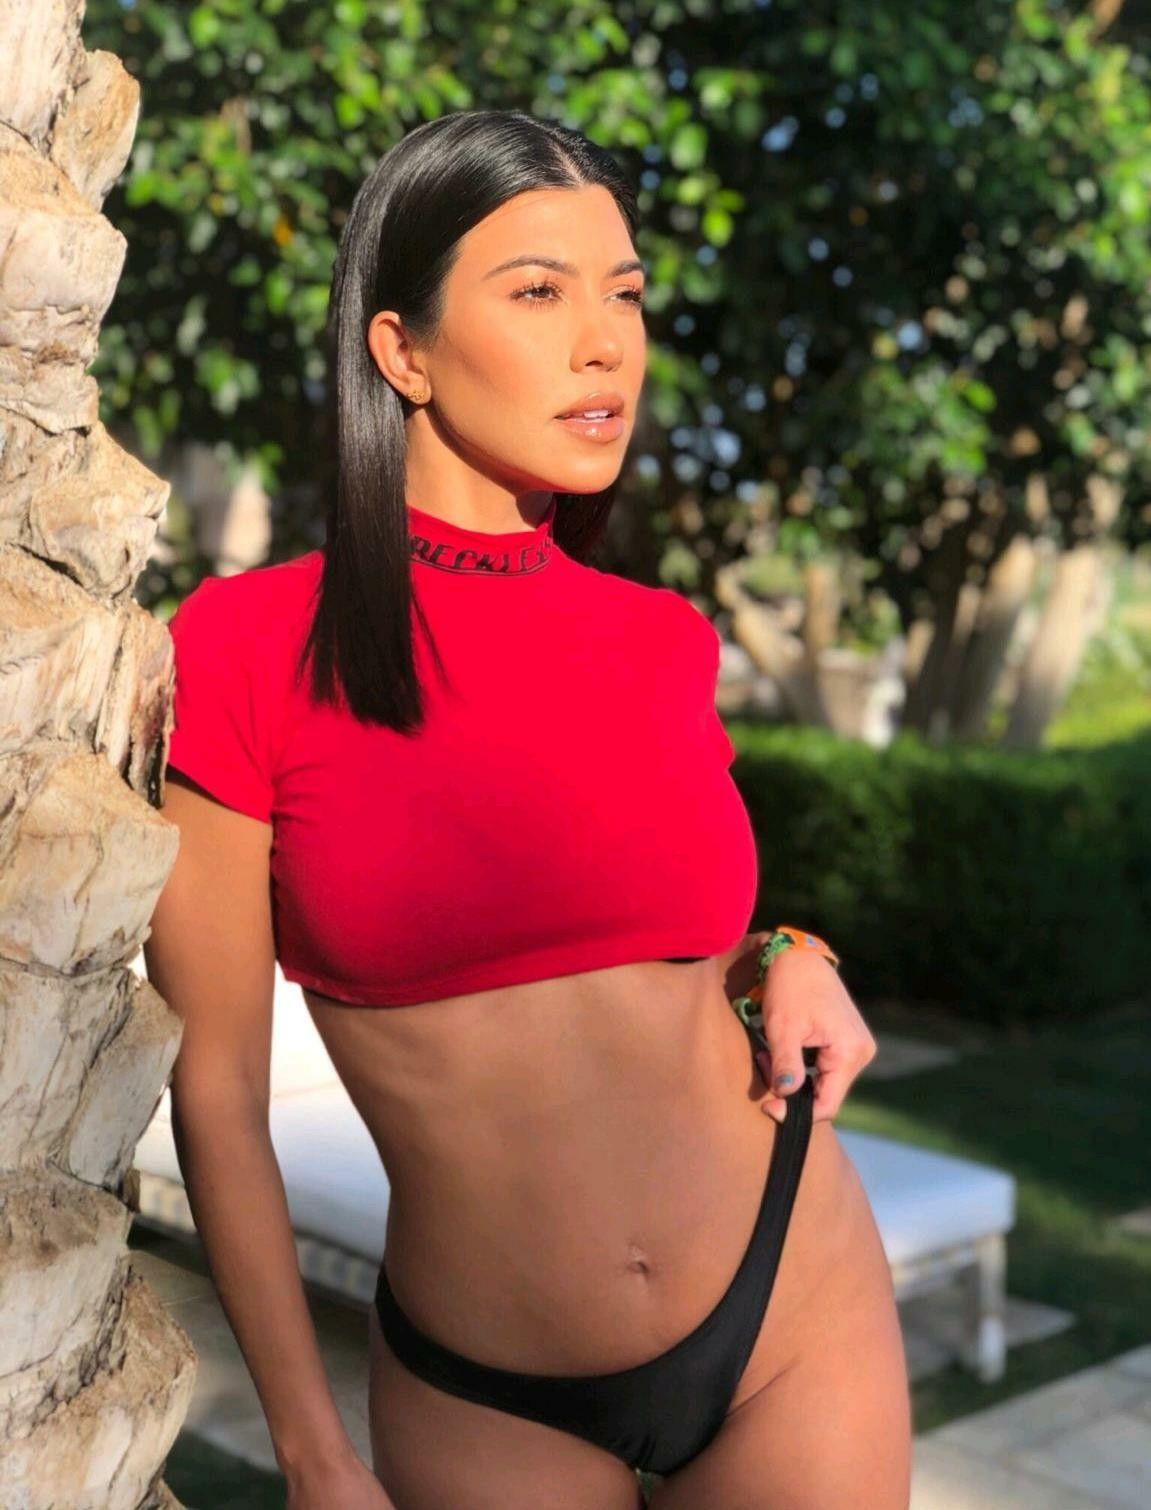 Communication on this topic: Alessandra Torresani See Through. 2018-2019 celebrityes photos leaks!, kourtney-kardashian-braless-2018-2019-celebrityes-photos-leaks/